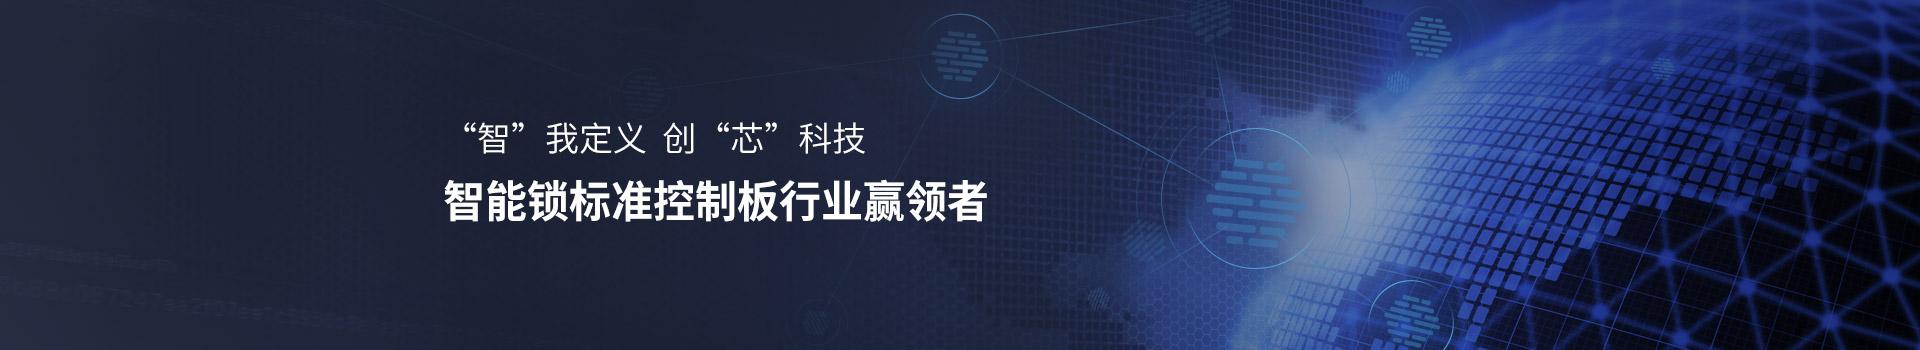 LECHT乐奇- 智能锁标准控制板行业赢领者